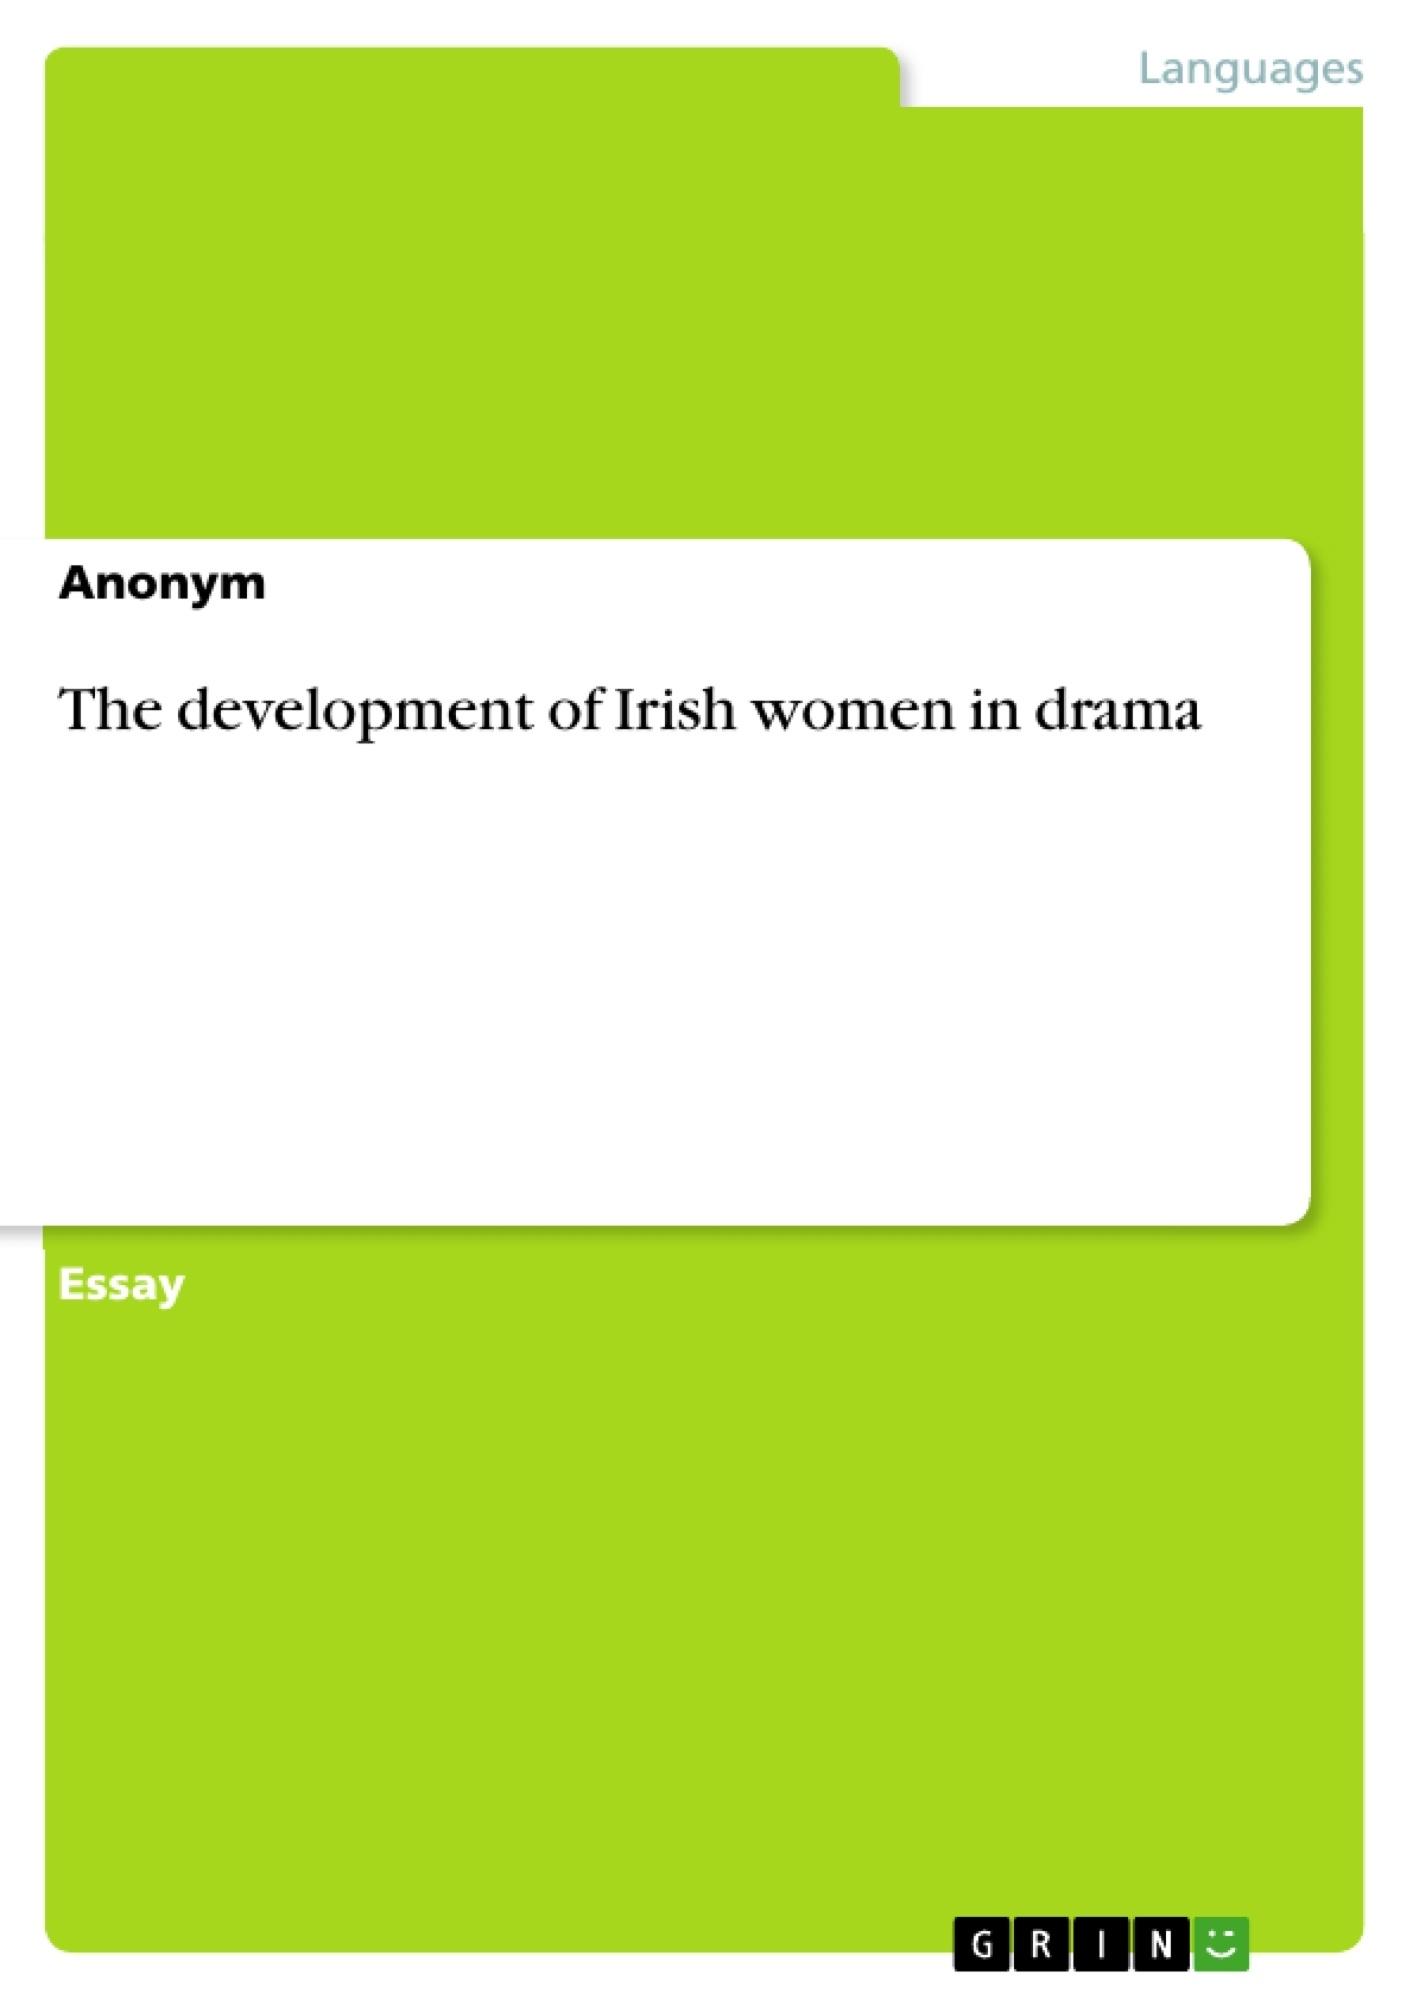 Title: The development of Irish women in drama